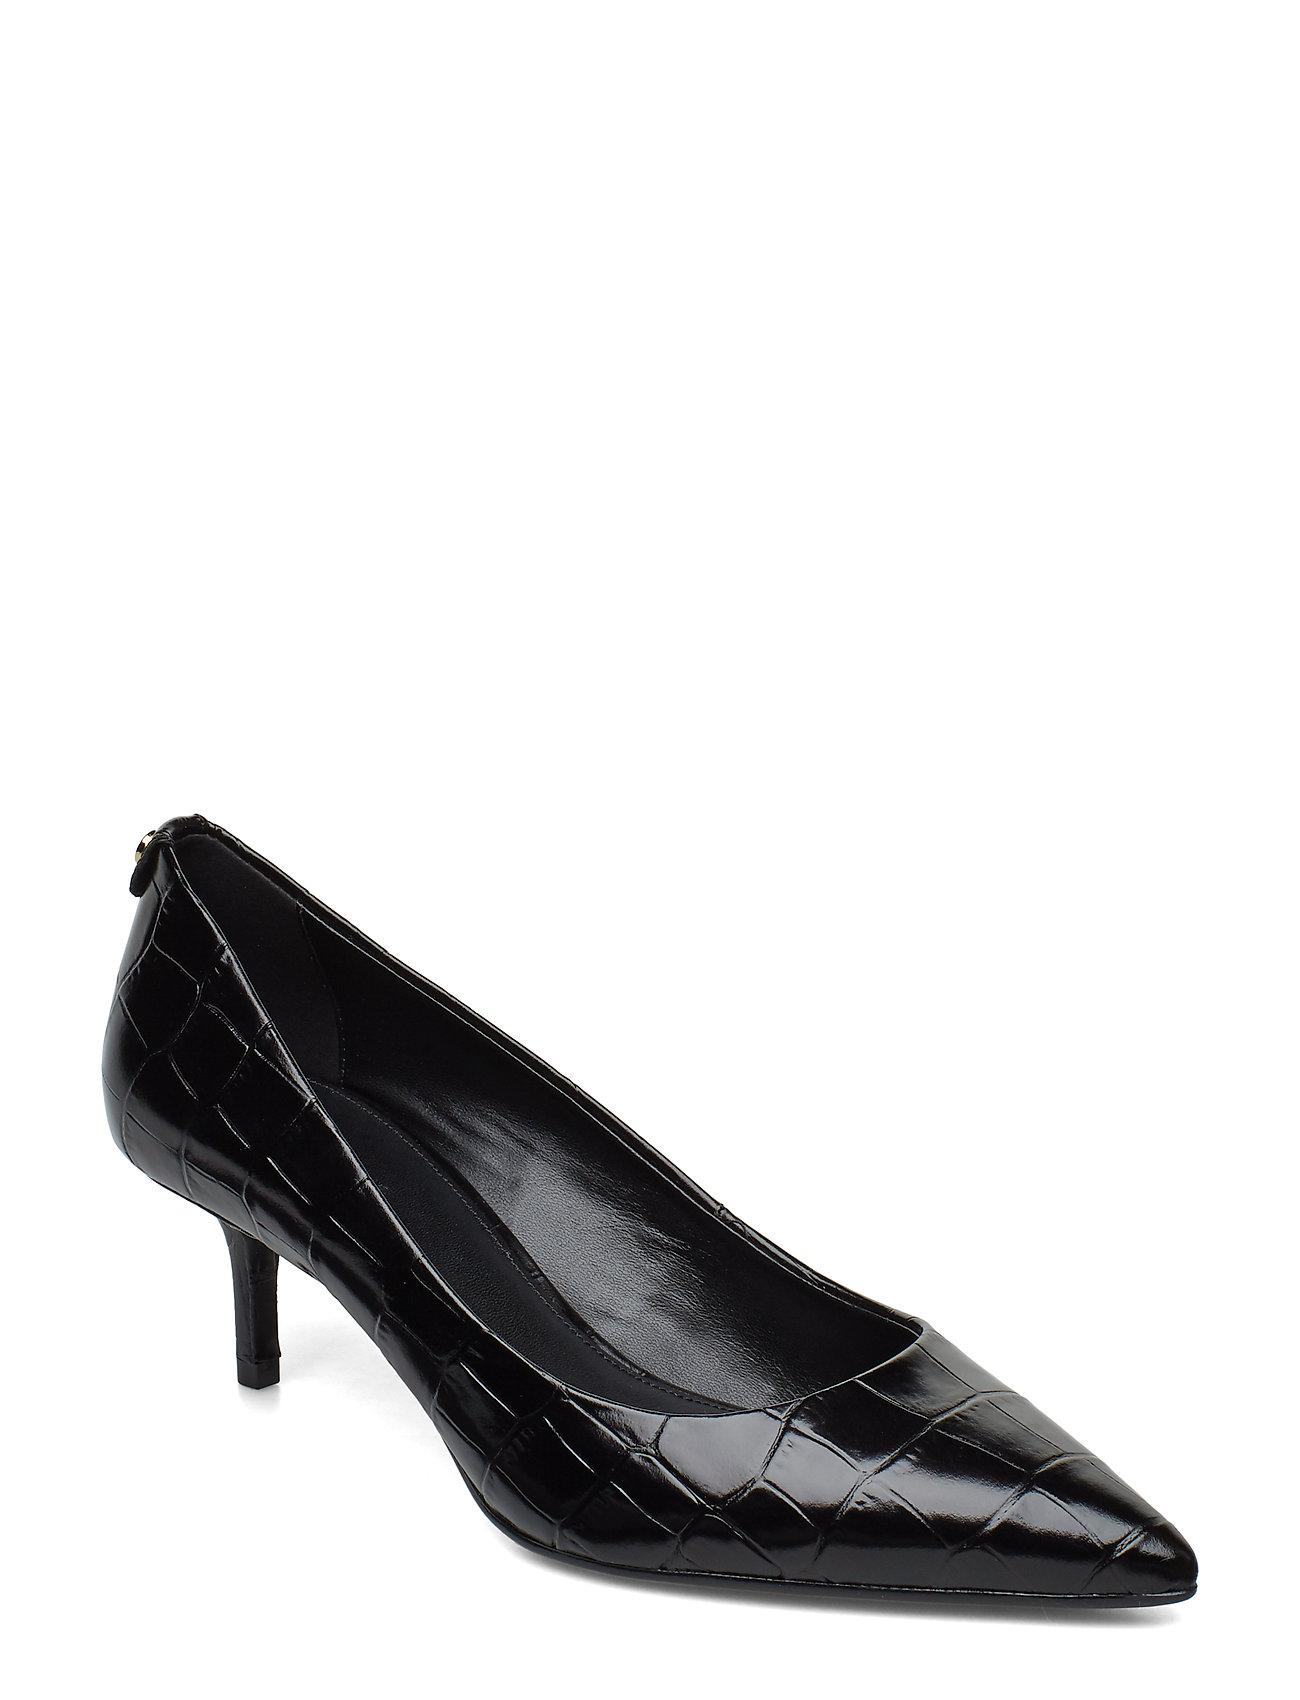 Michael Kors Shoes MK-FLEX KITTEN PUMP - BLACK